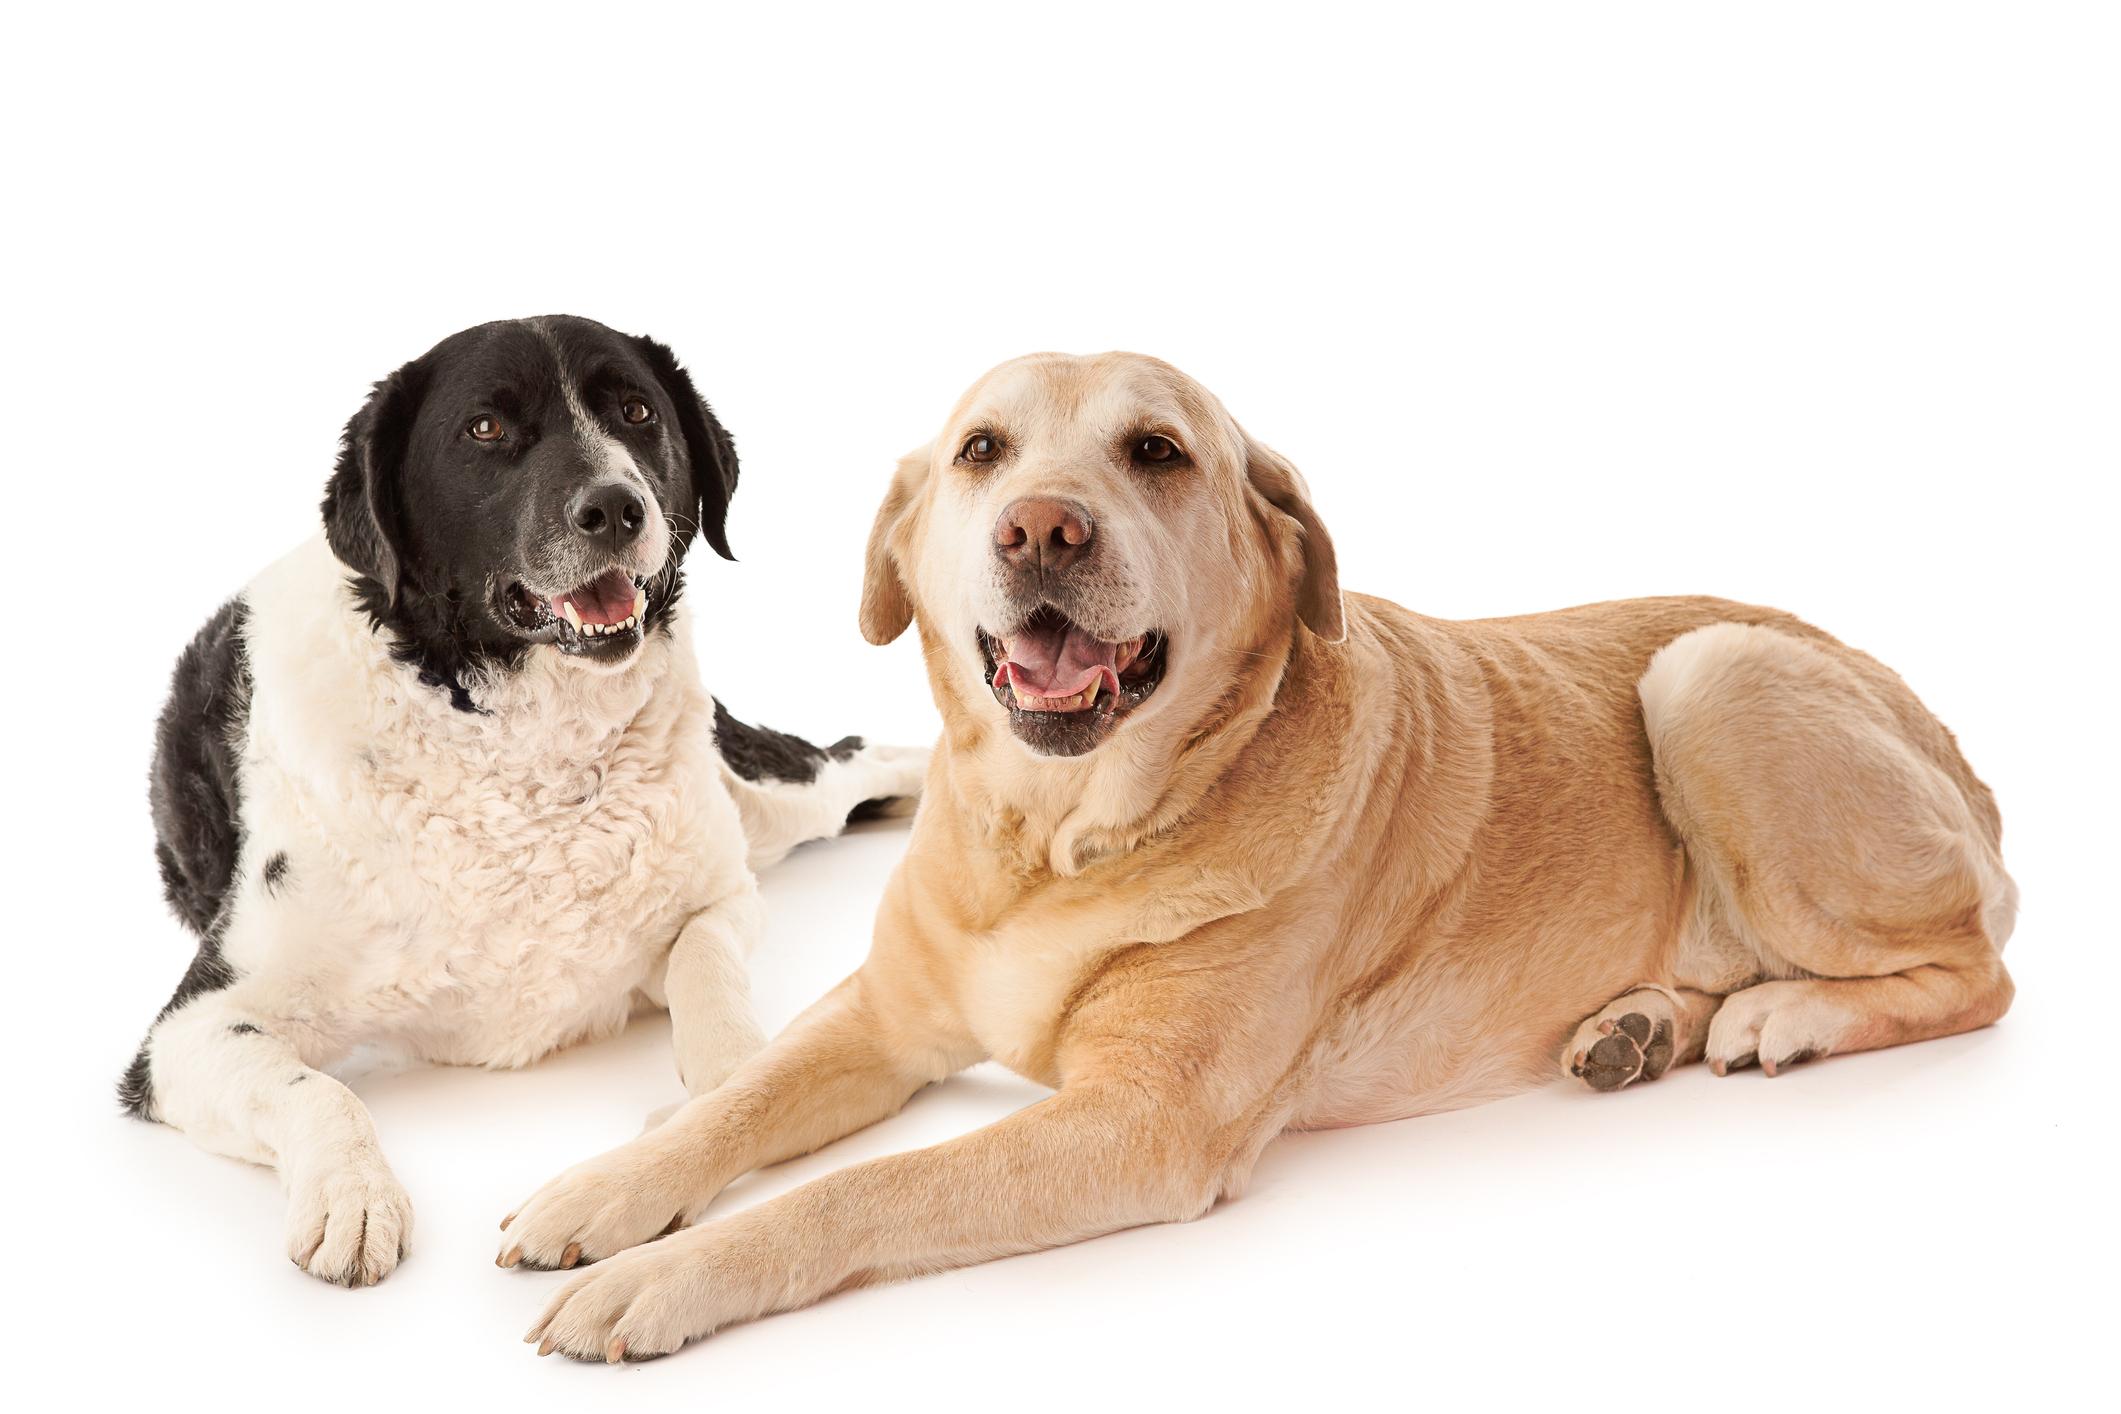 Reactive Dog Class 2 - Prerequisite: Reactive Dog Class 1